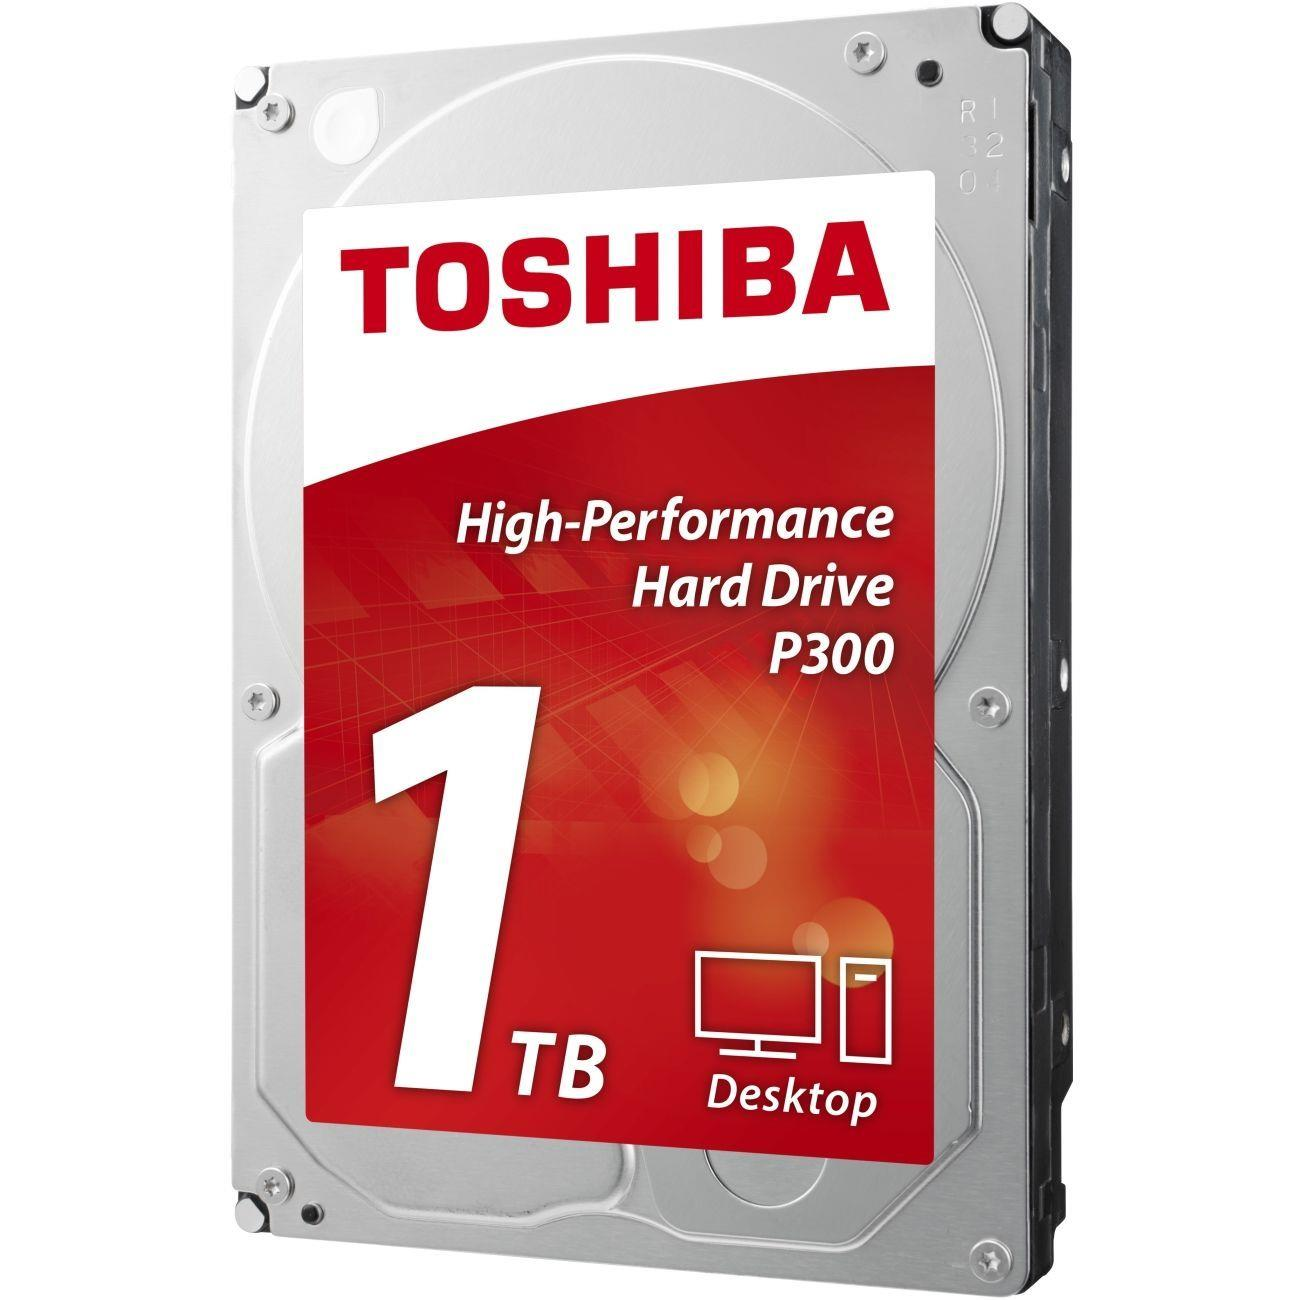 Dysk Toshiba P300 HDWD110UZSVA 3,5 cal  1TB SATA-III 7200 64MB BULK (1)